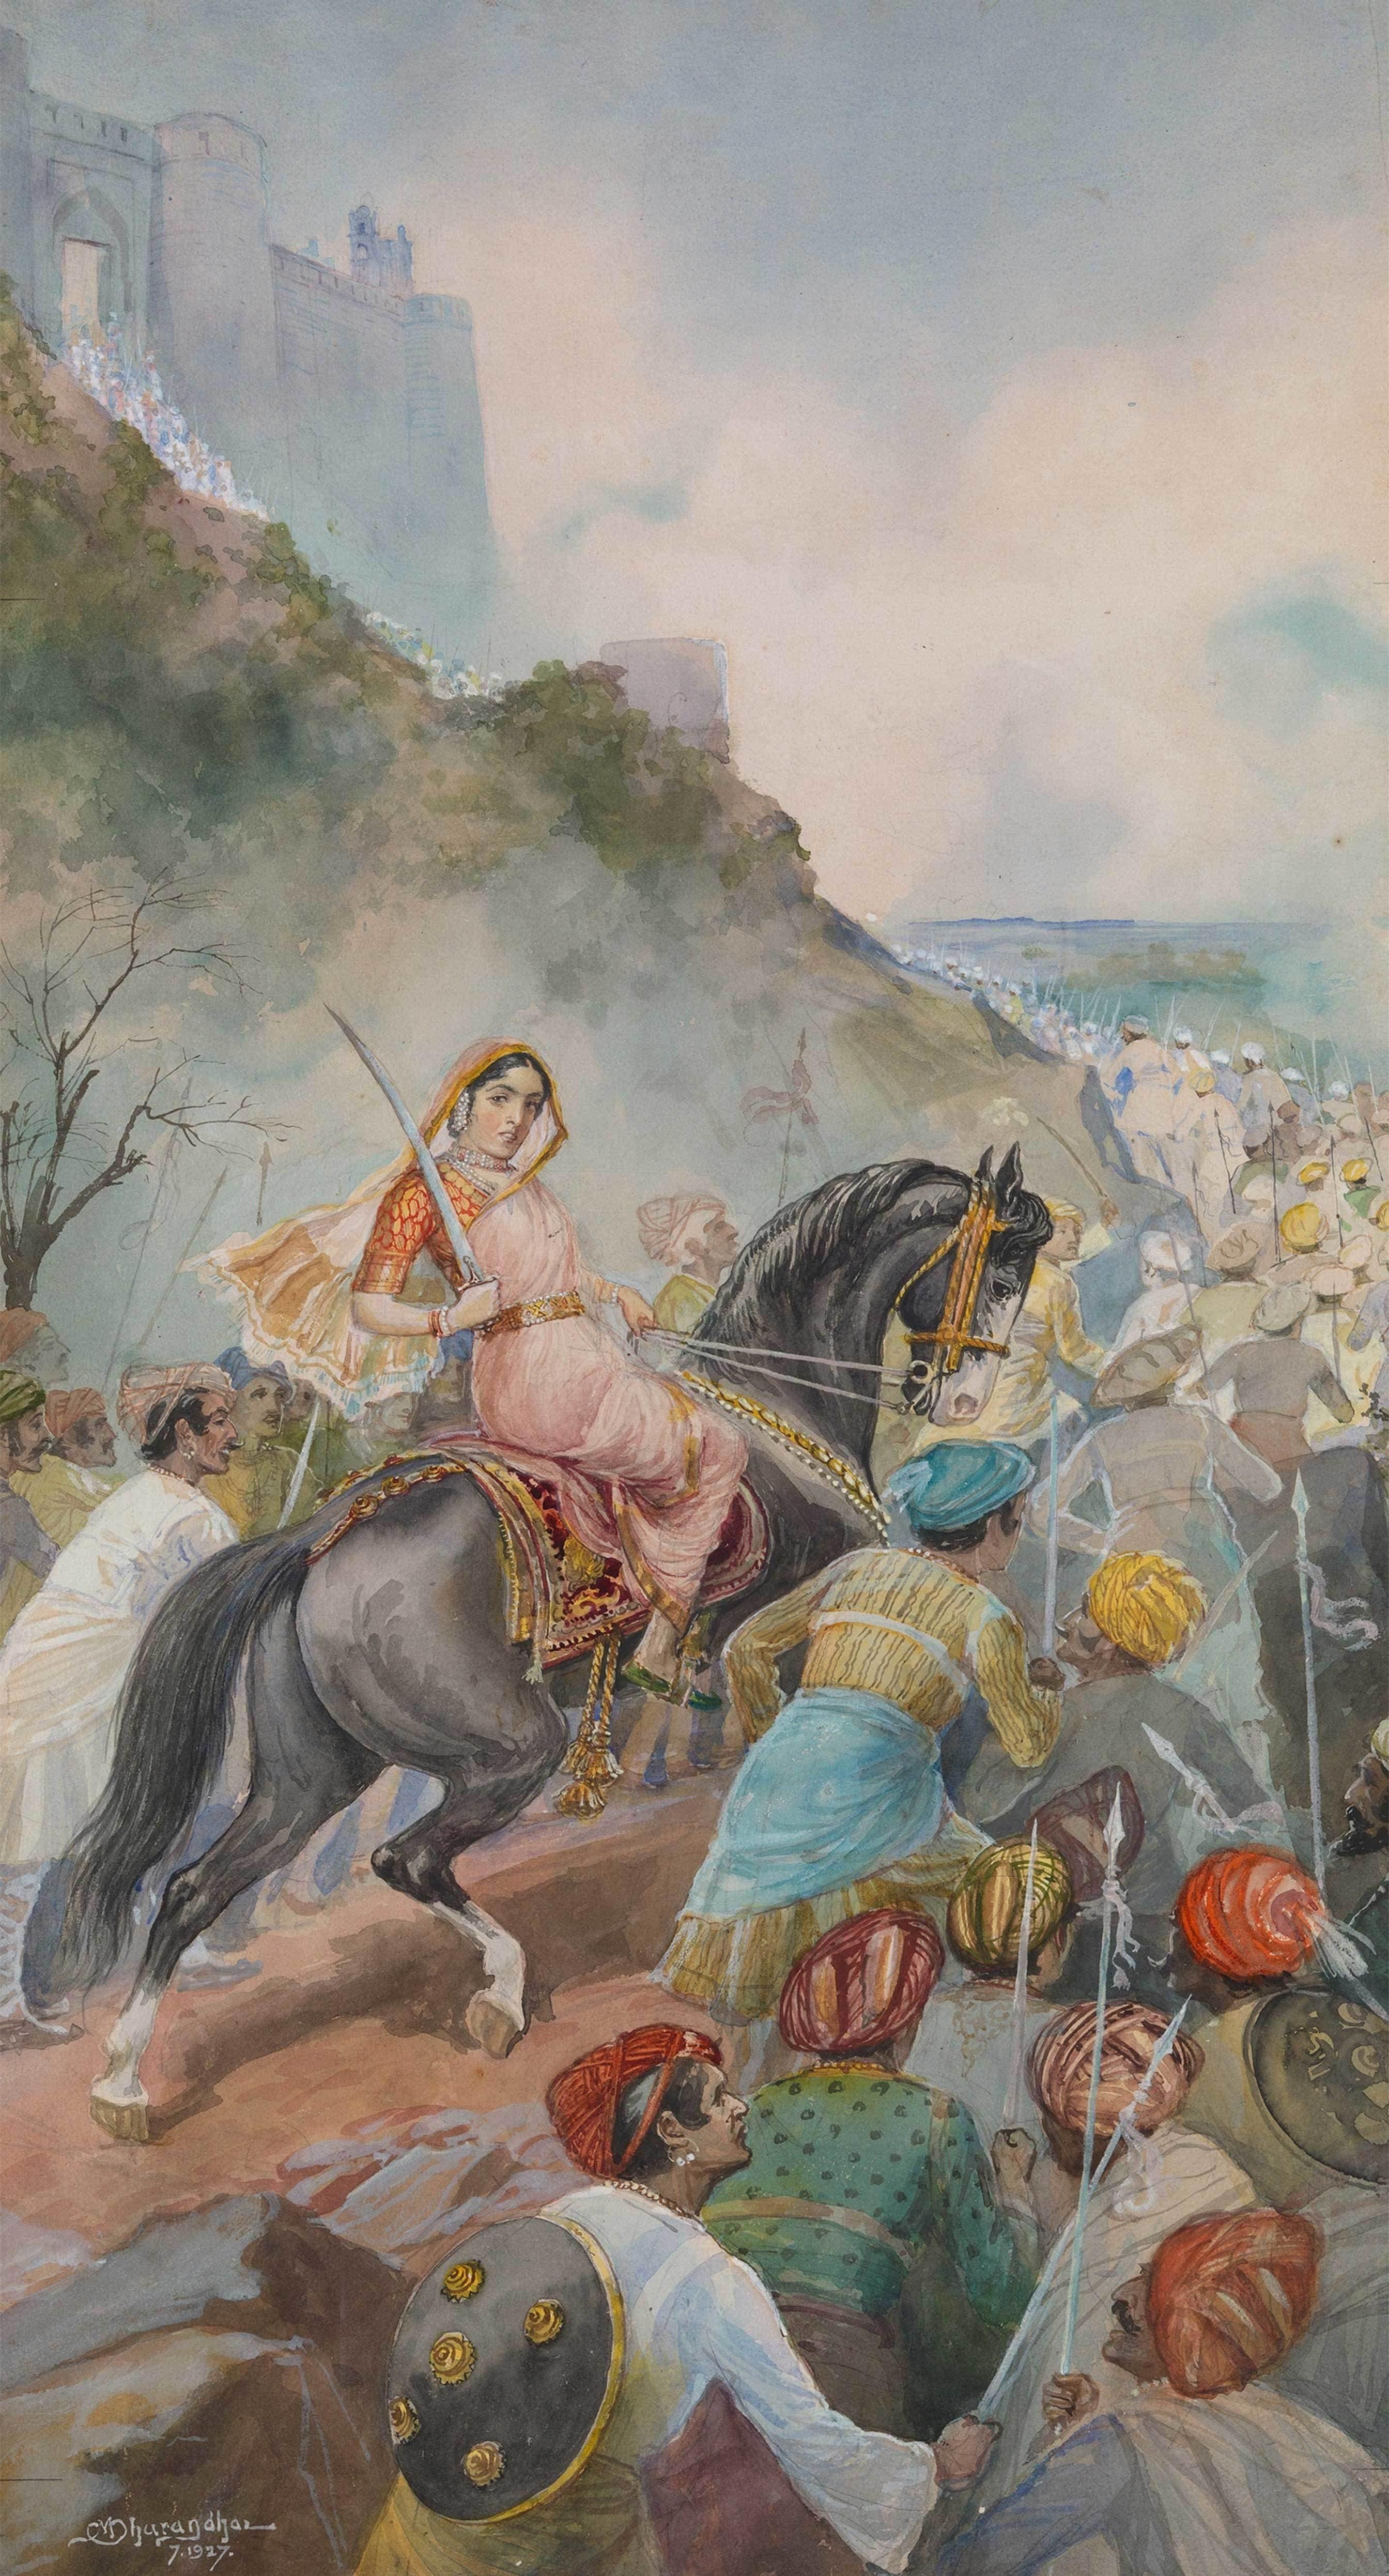 A 1927 depiction of Tarabai in battle by noted Marathi painter M. V. Dhurandhar.